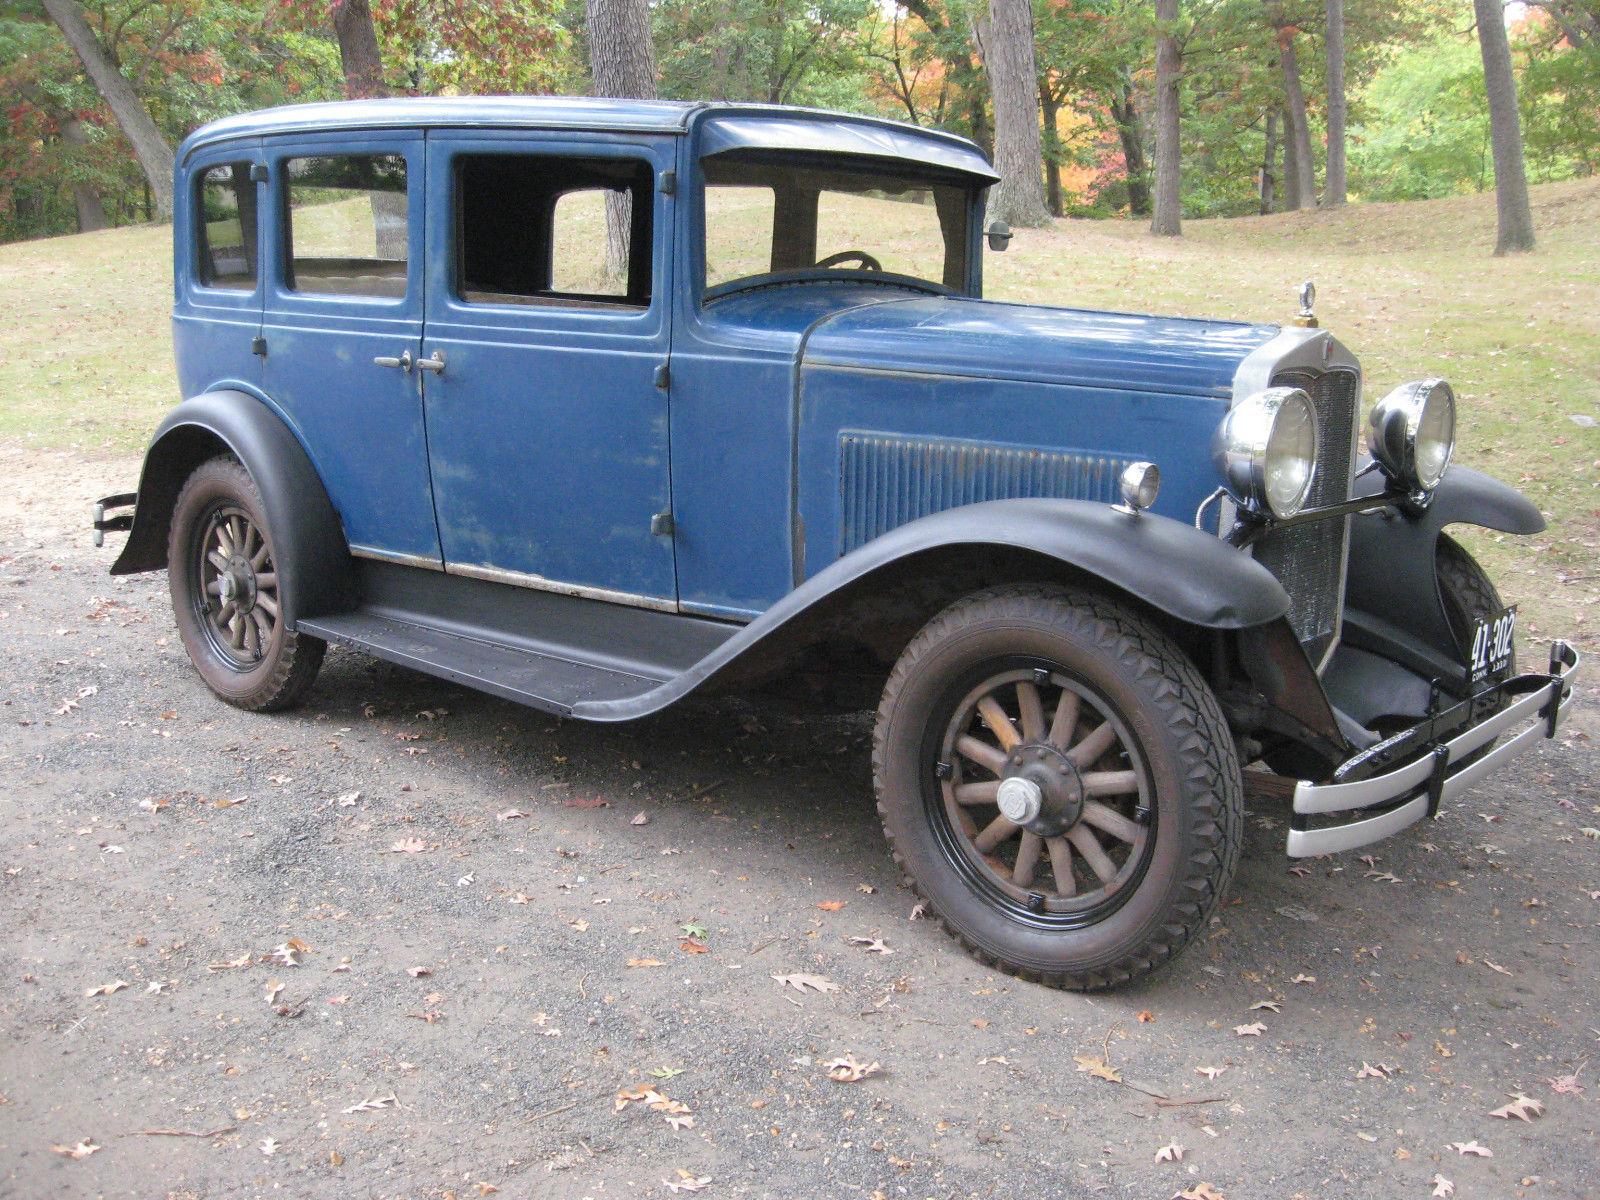 1930 Hupmobile Century Six Sedan for sale: photos, technical ...